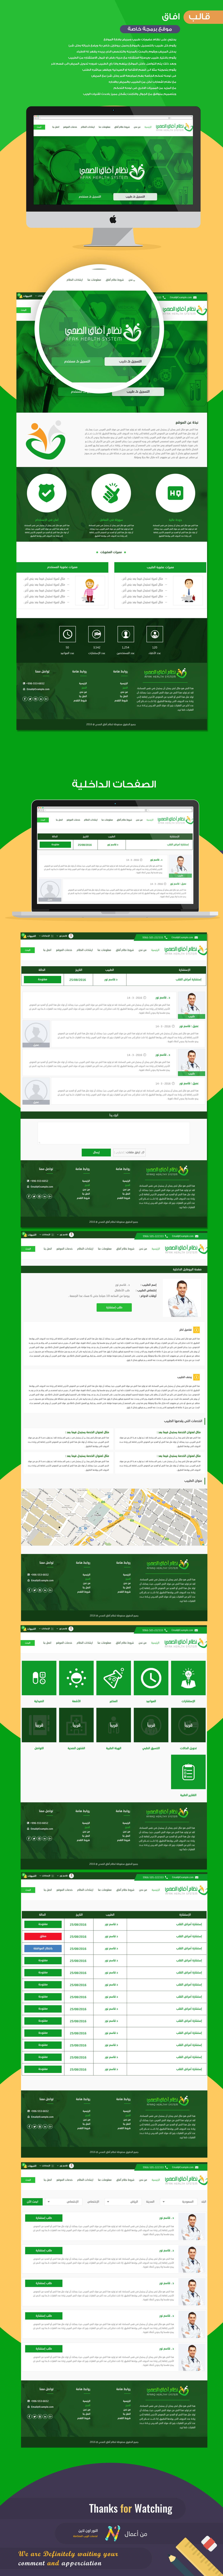 corporate design logo تصميم ووردبريس wordpress elnooronline website template website themes Web Design  medical